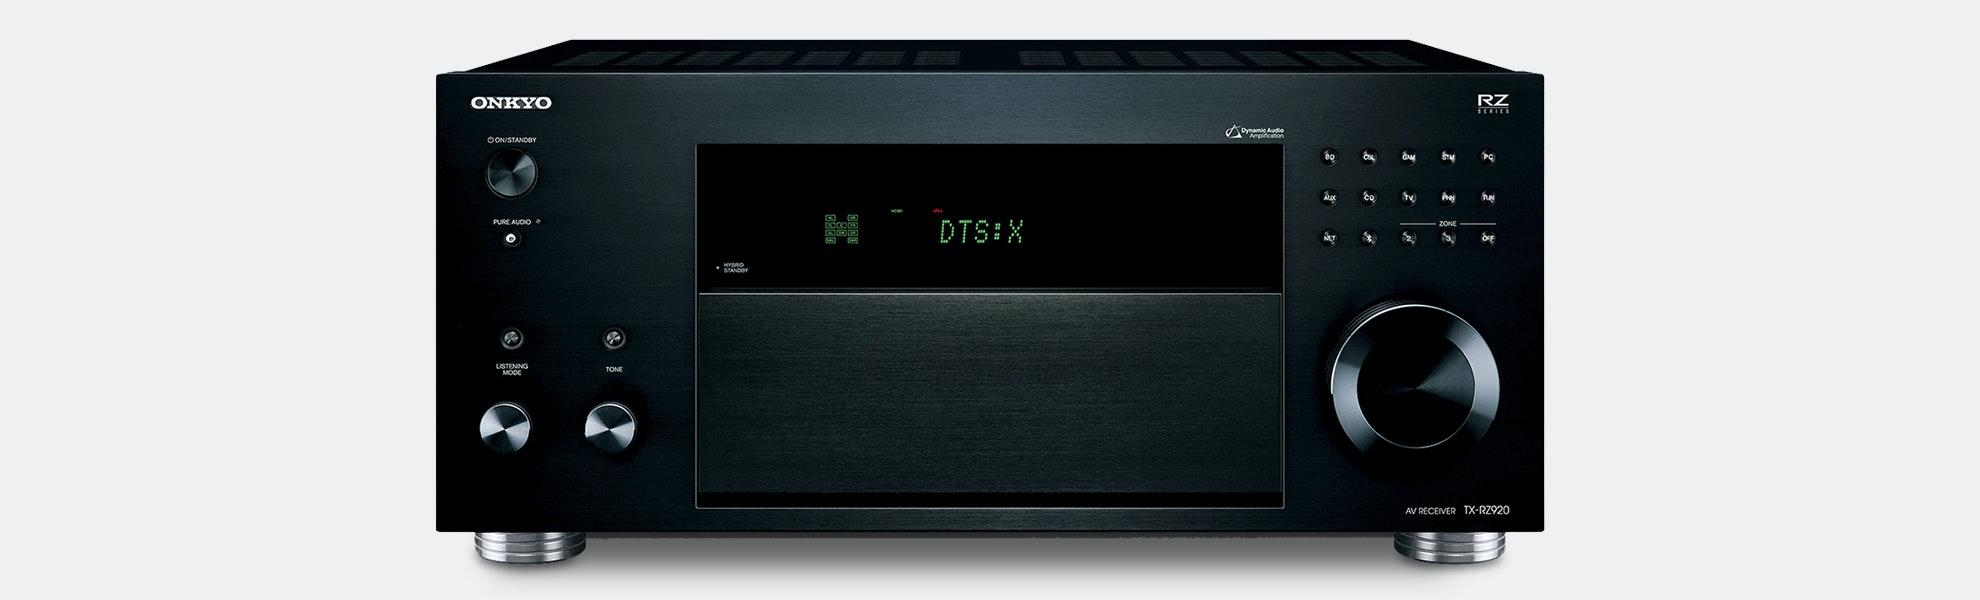 Onkyo TX-RZ Series THX Dolby Atmos DTS:X Receivers